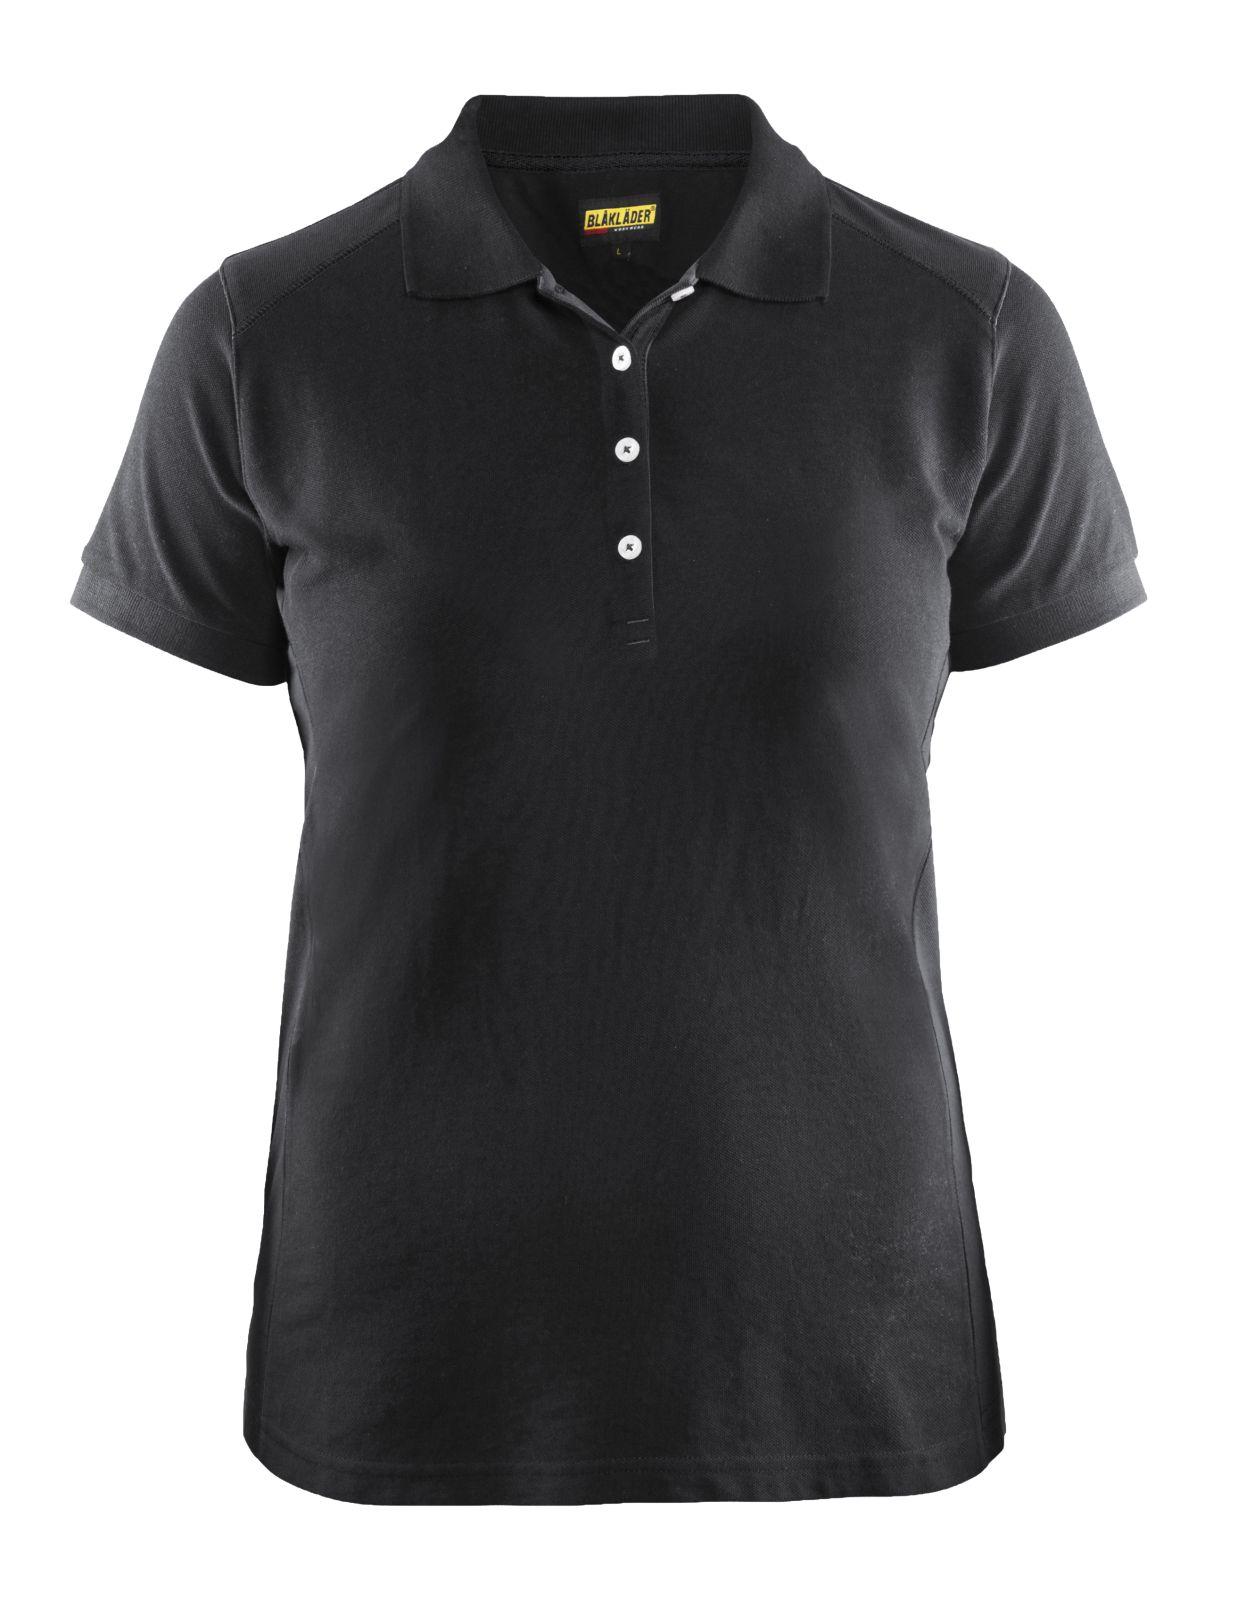 Blaklader Dames polo shirts 33901050 zwart(9900)